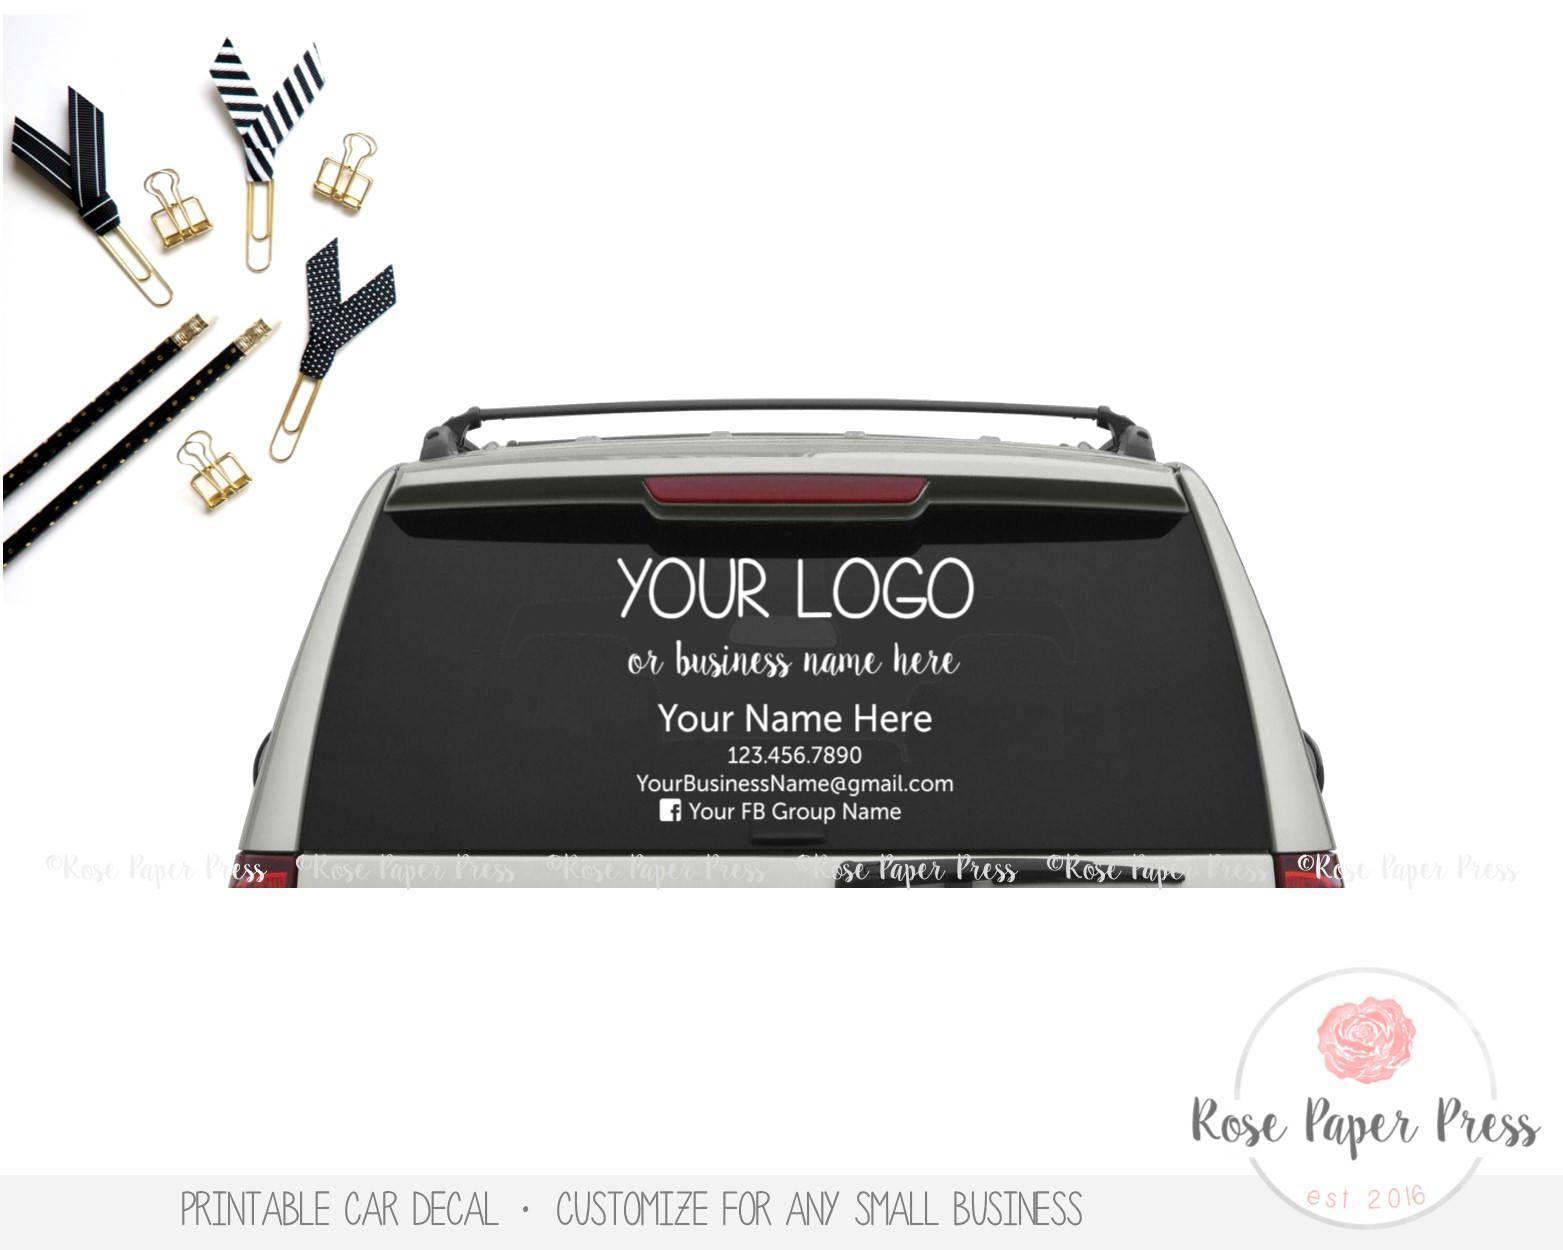 Car decal custom printable decal small business